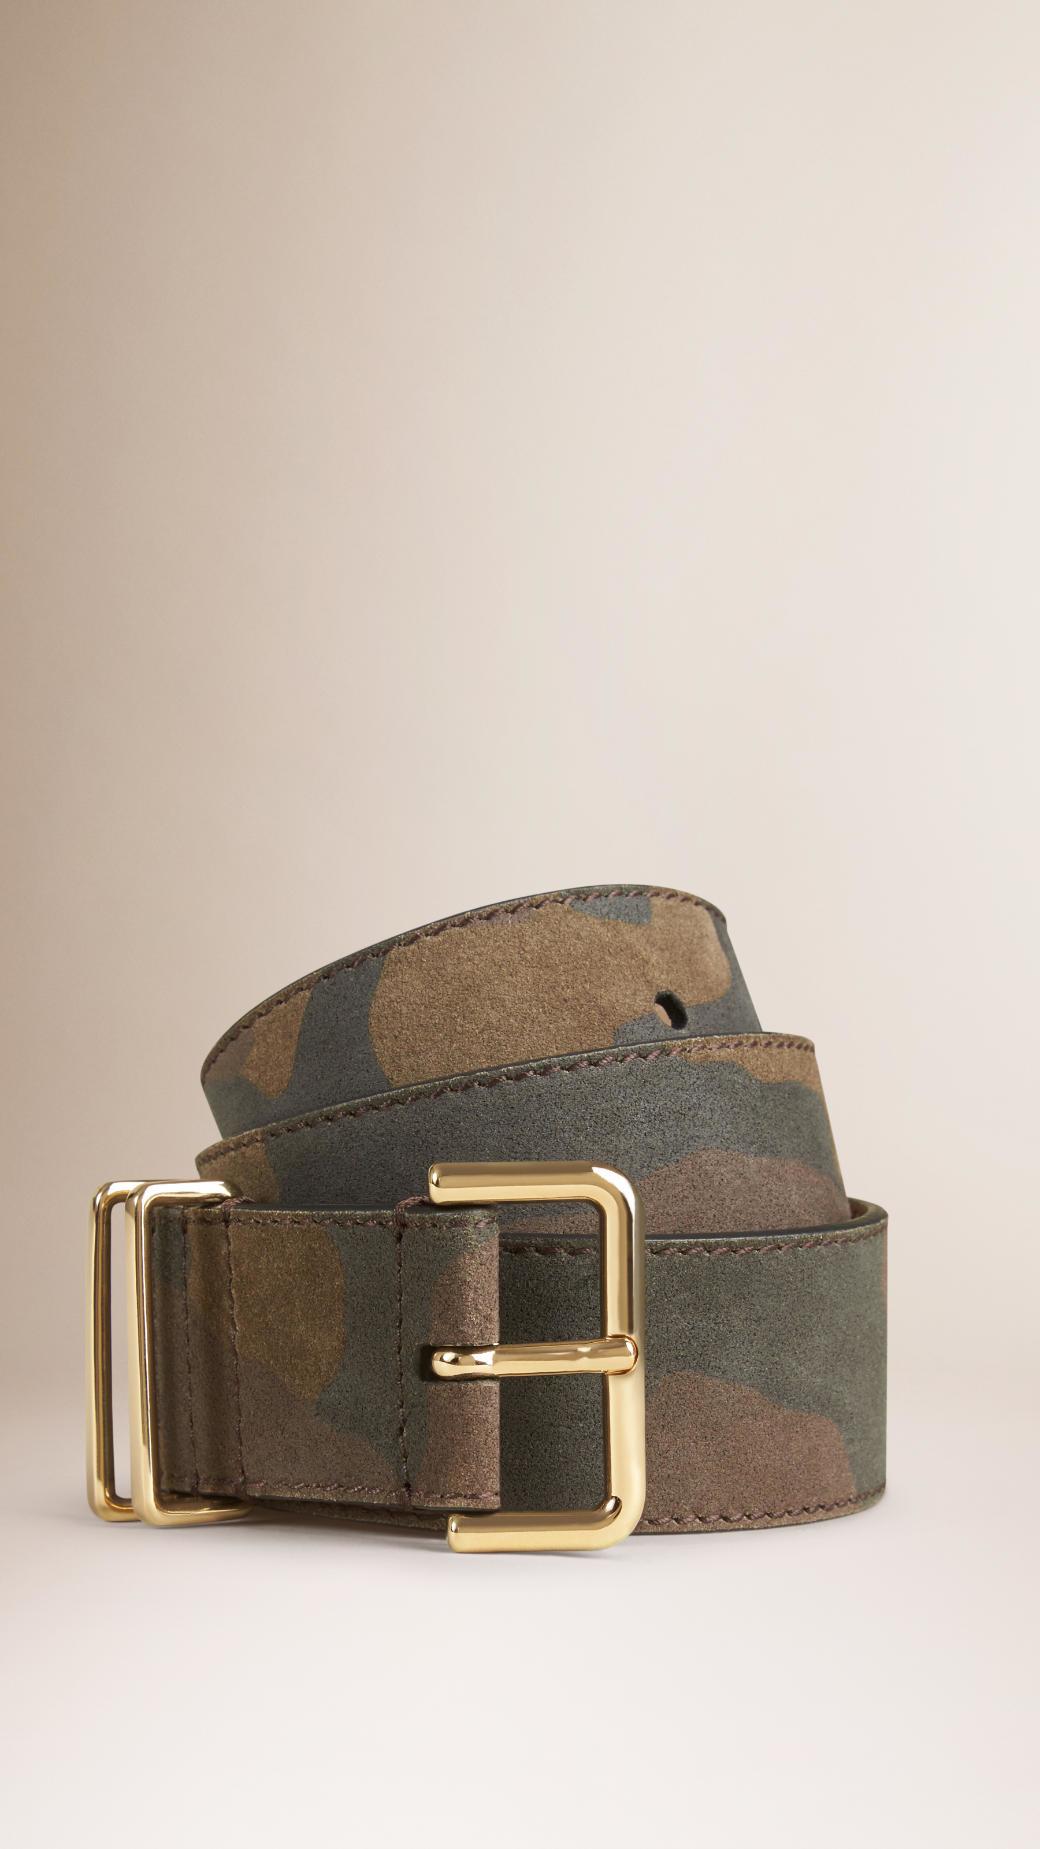 971ebf50c2c ... order lyst burberry camo print calfskin belt in green 35687 569f0